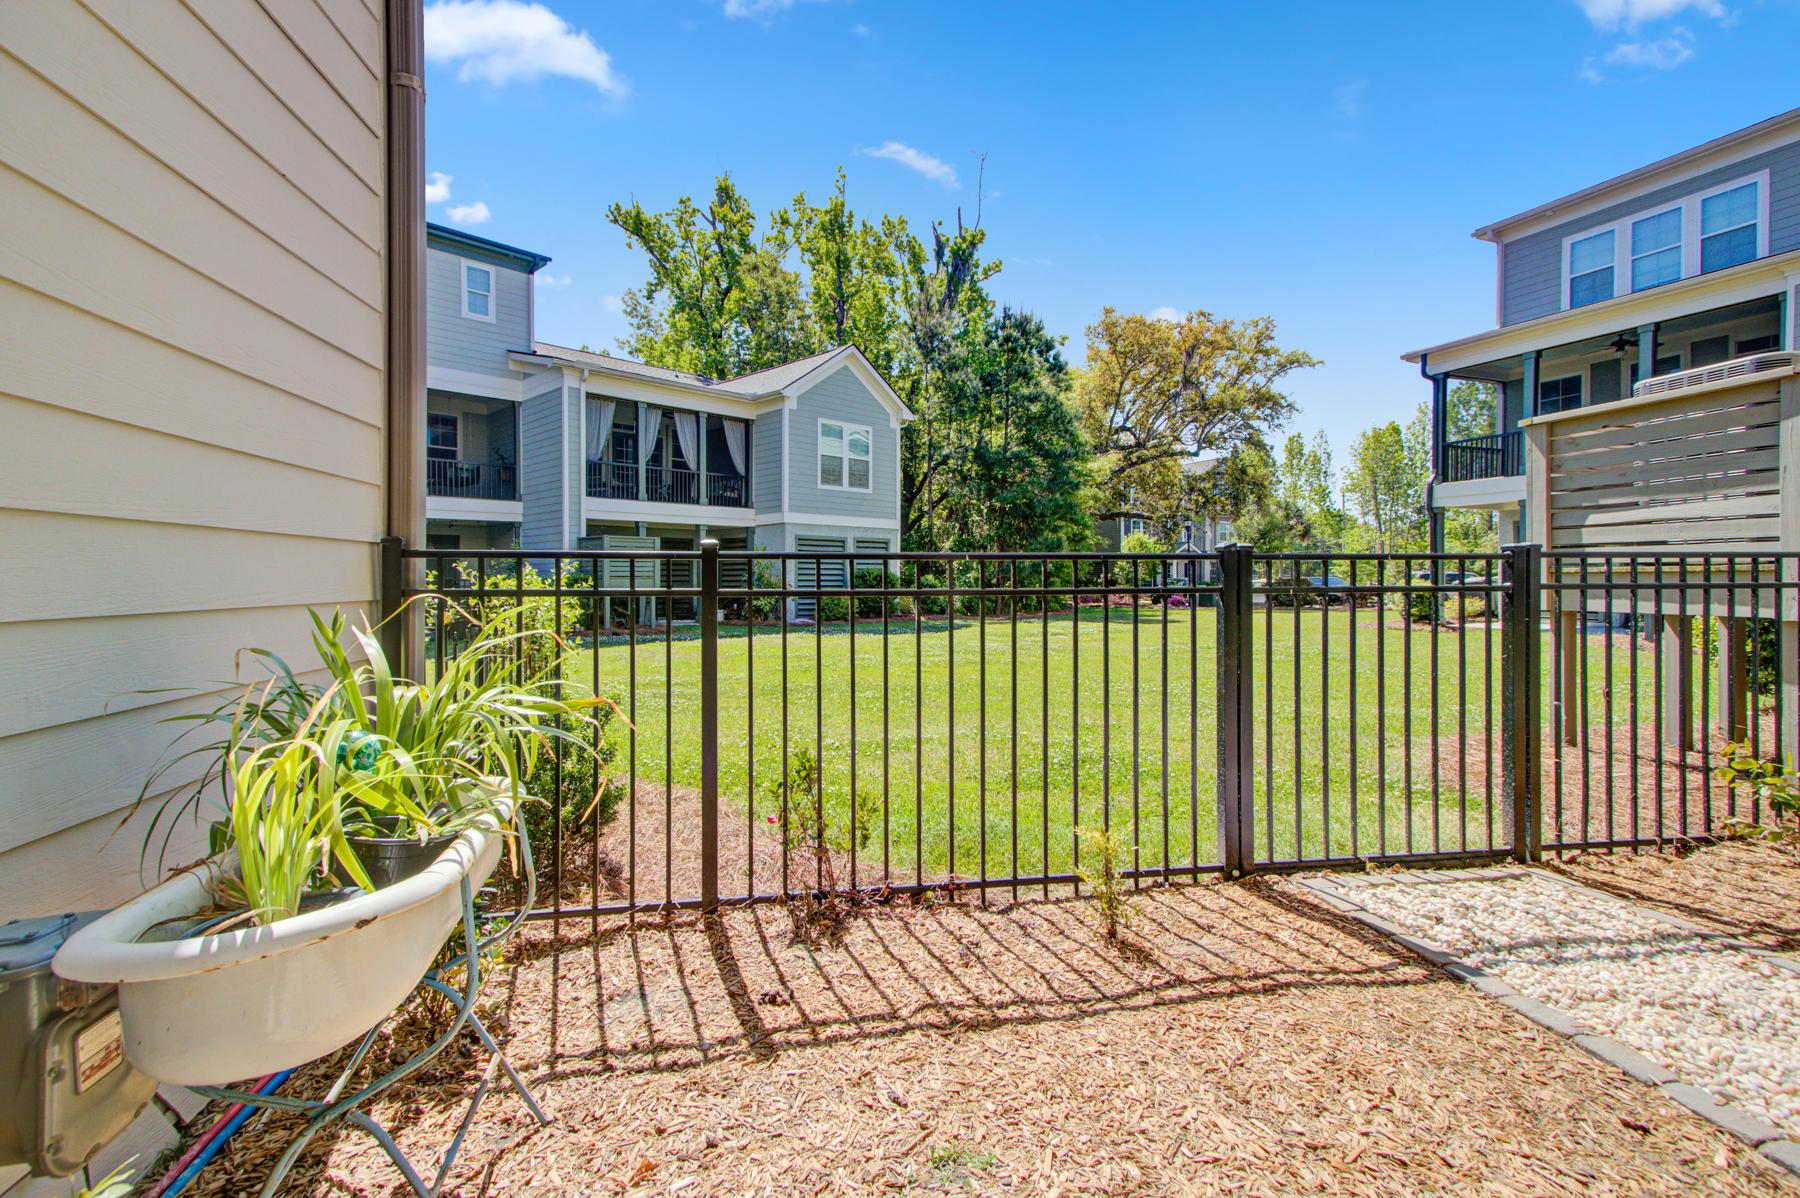 Etiwan Pointe Homes For Sale - 254 Slipper Shell, Mount Pleasant, SC - 34